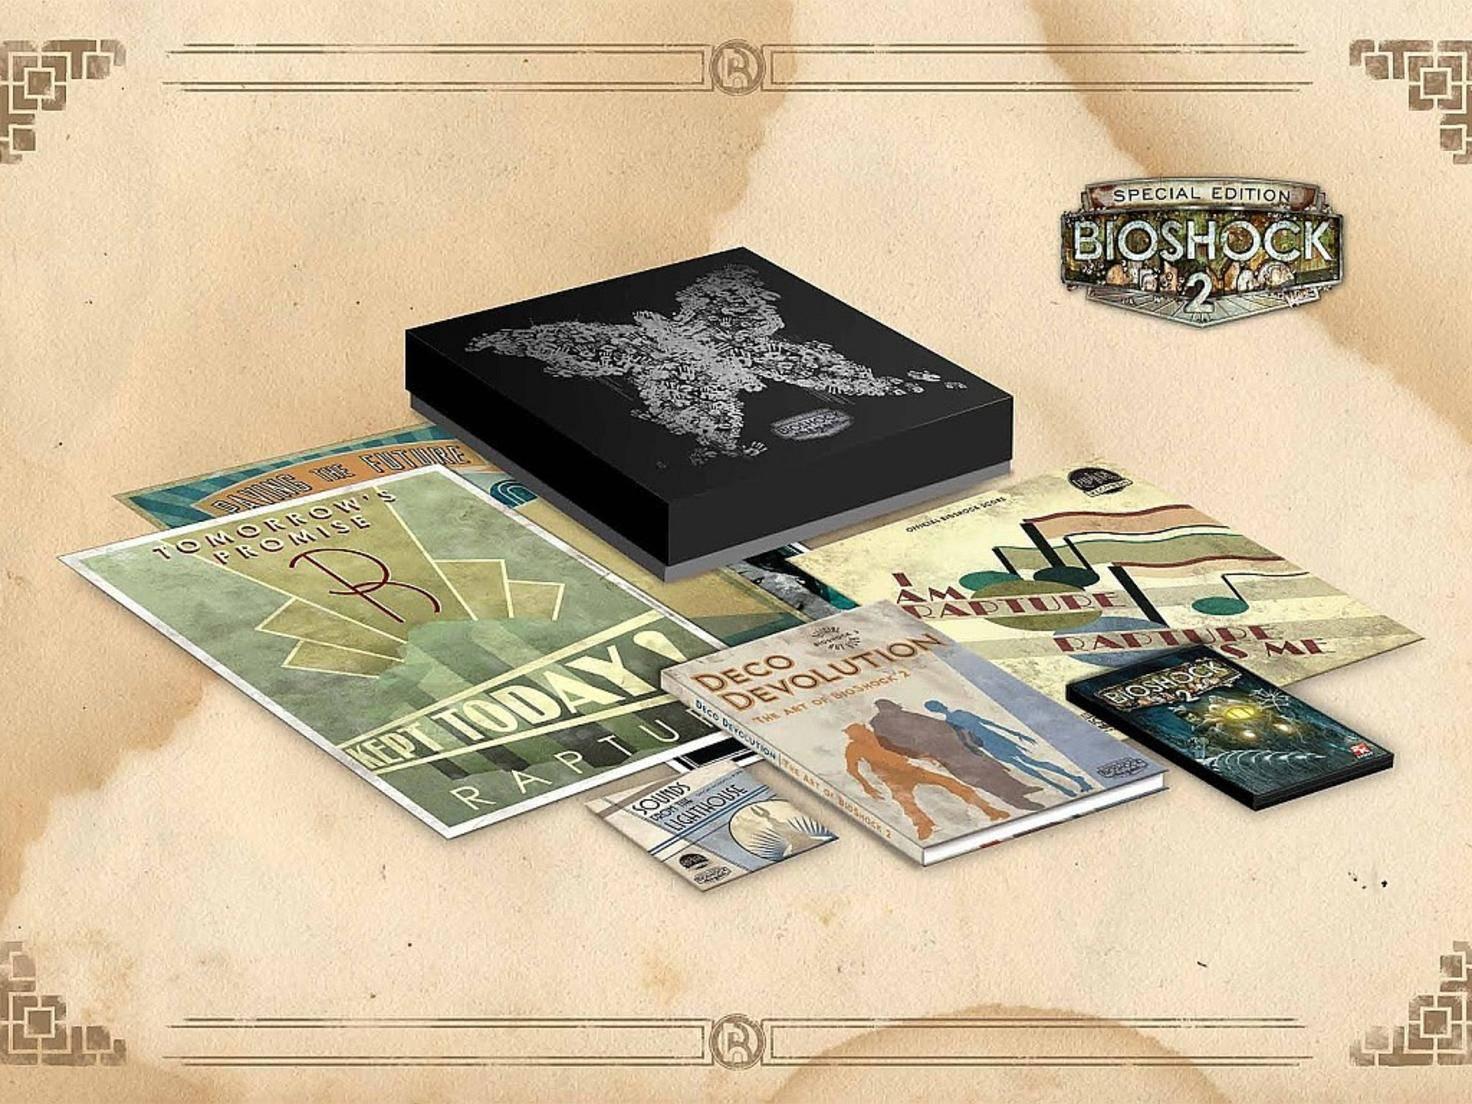 BioShock_2_Special_Edition.jpg